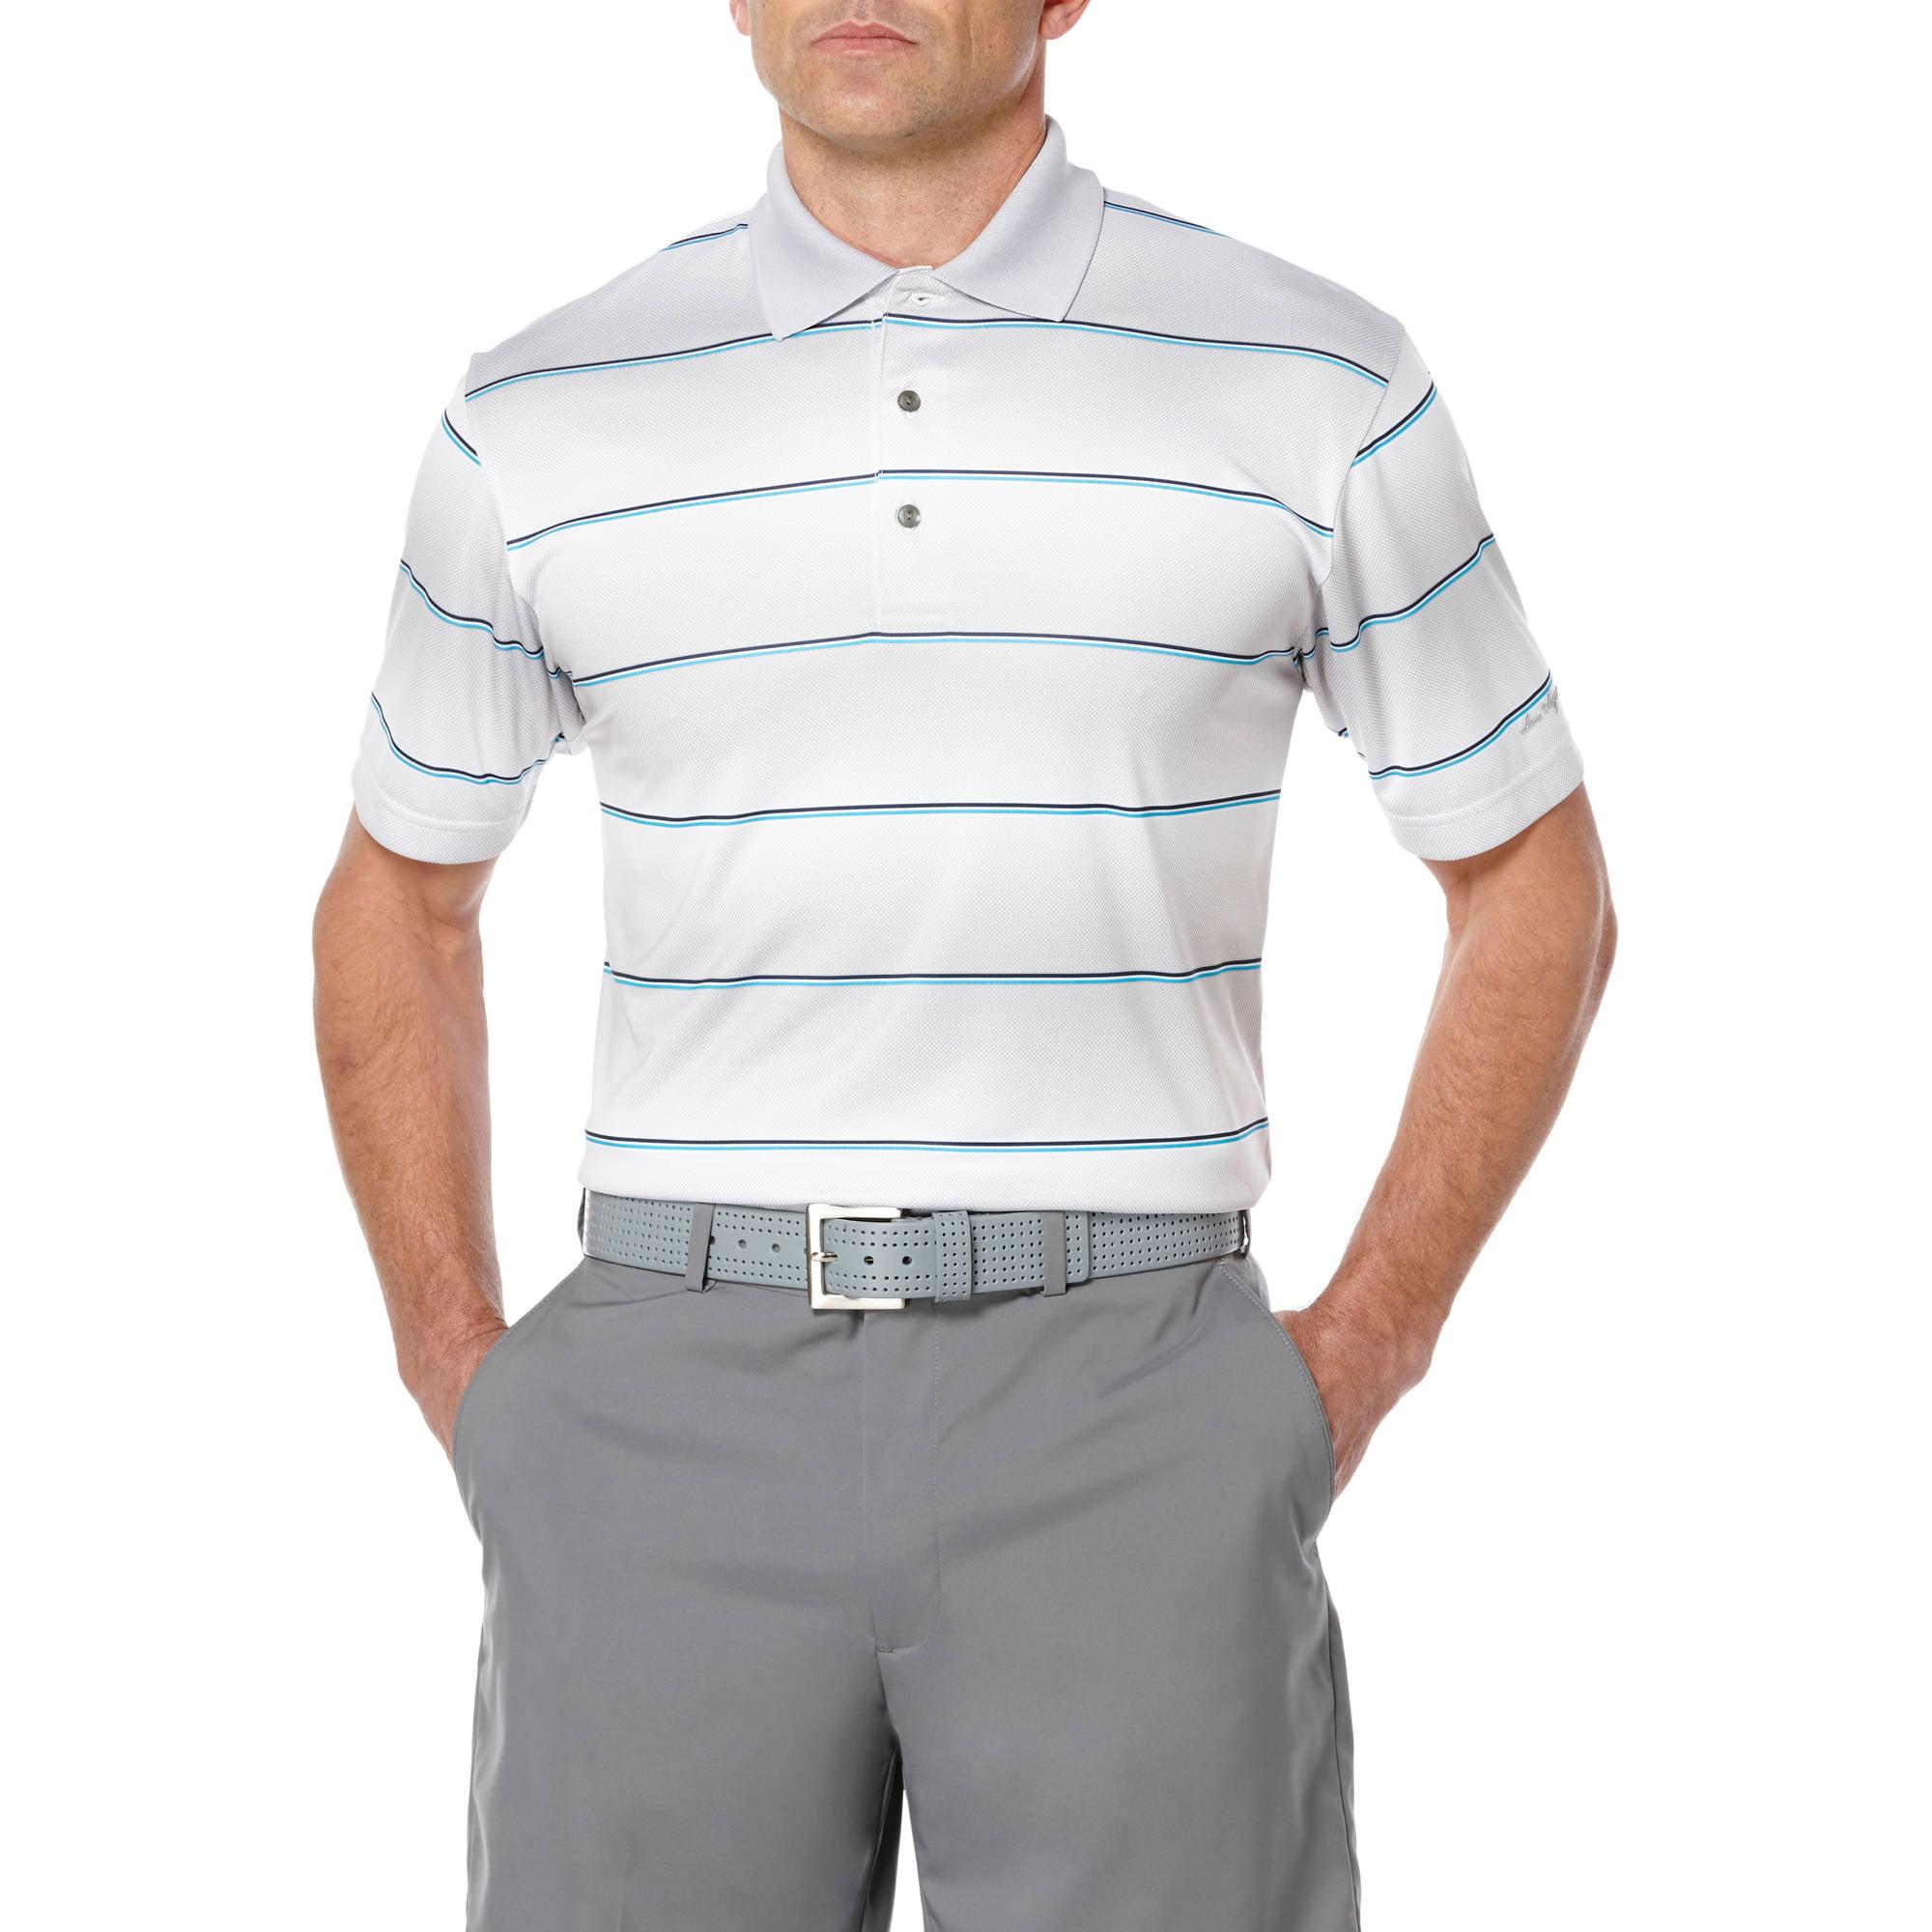 Ben Hogan Performance Big Men's Textured Stripe Polo Shirt